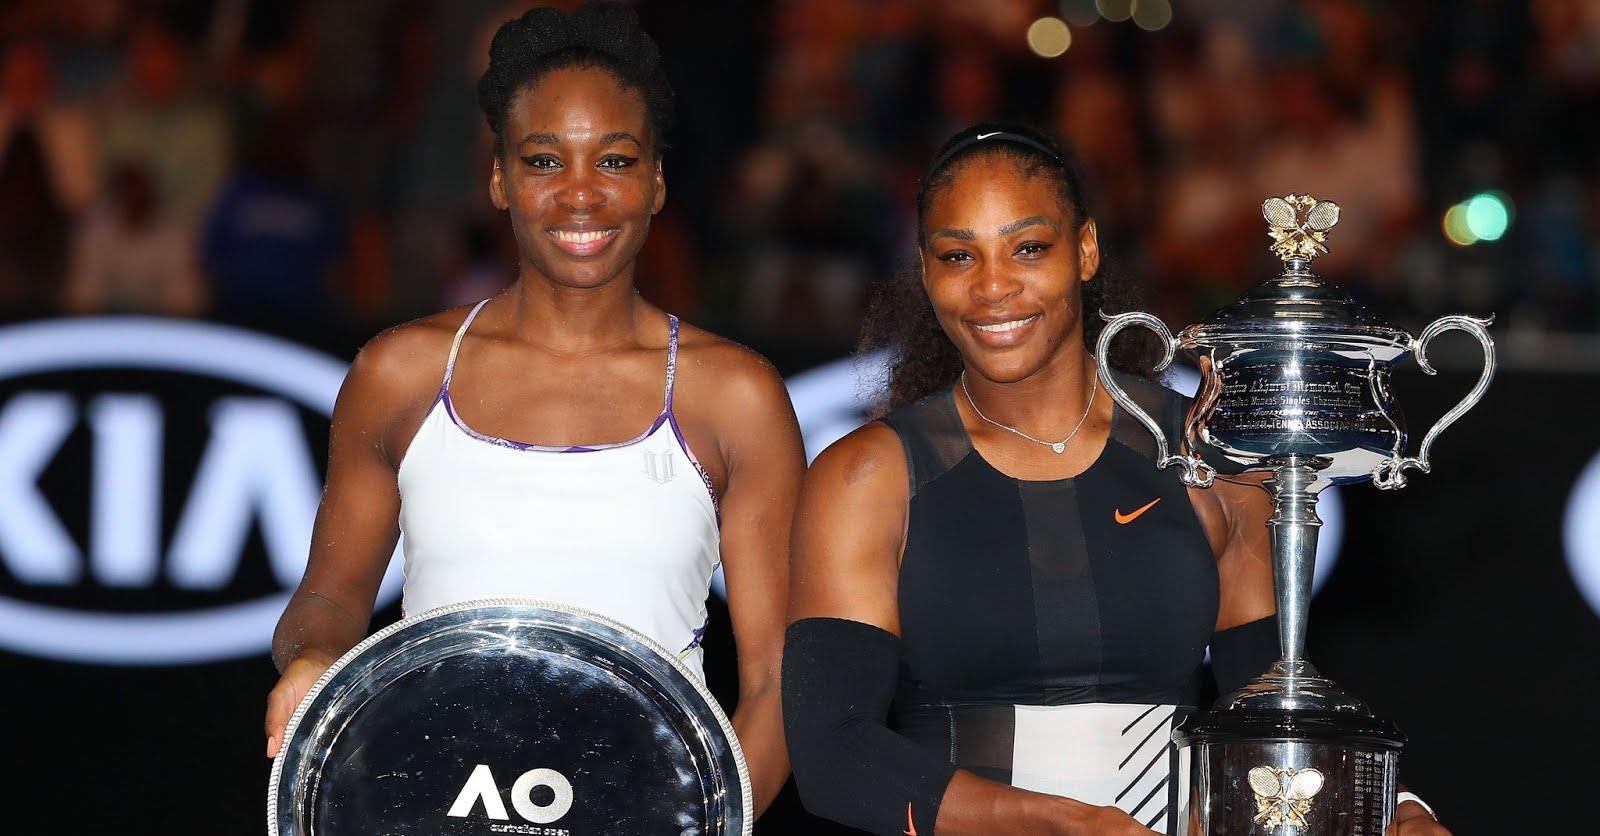 Venus Williams Sends a Post Match Message to Serena Williams After Wimbledon 2017 Loss